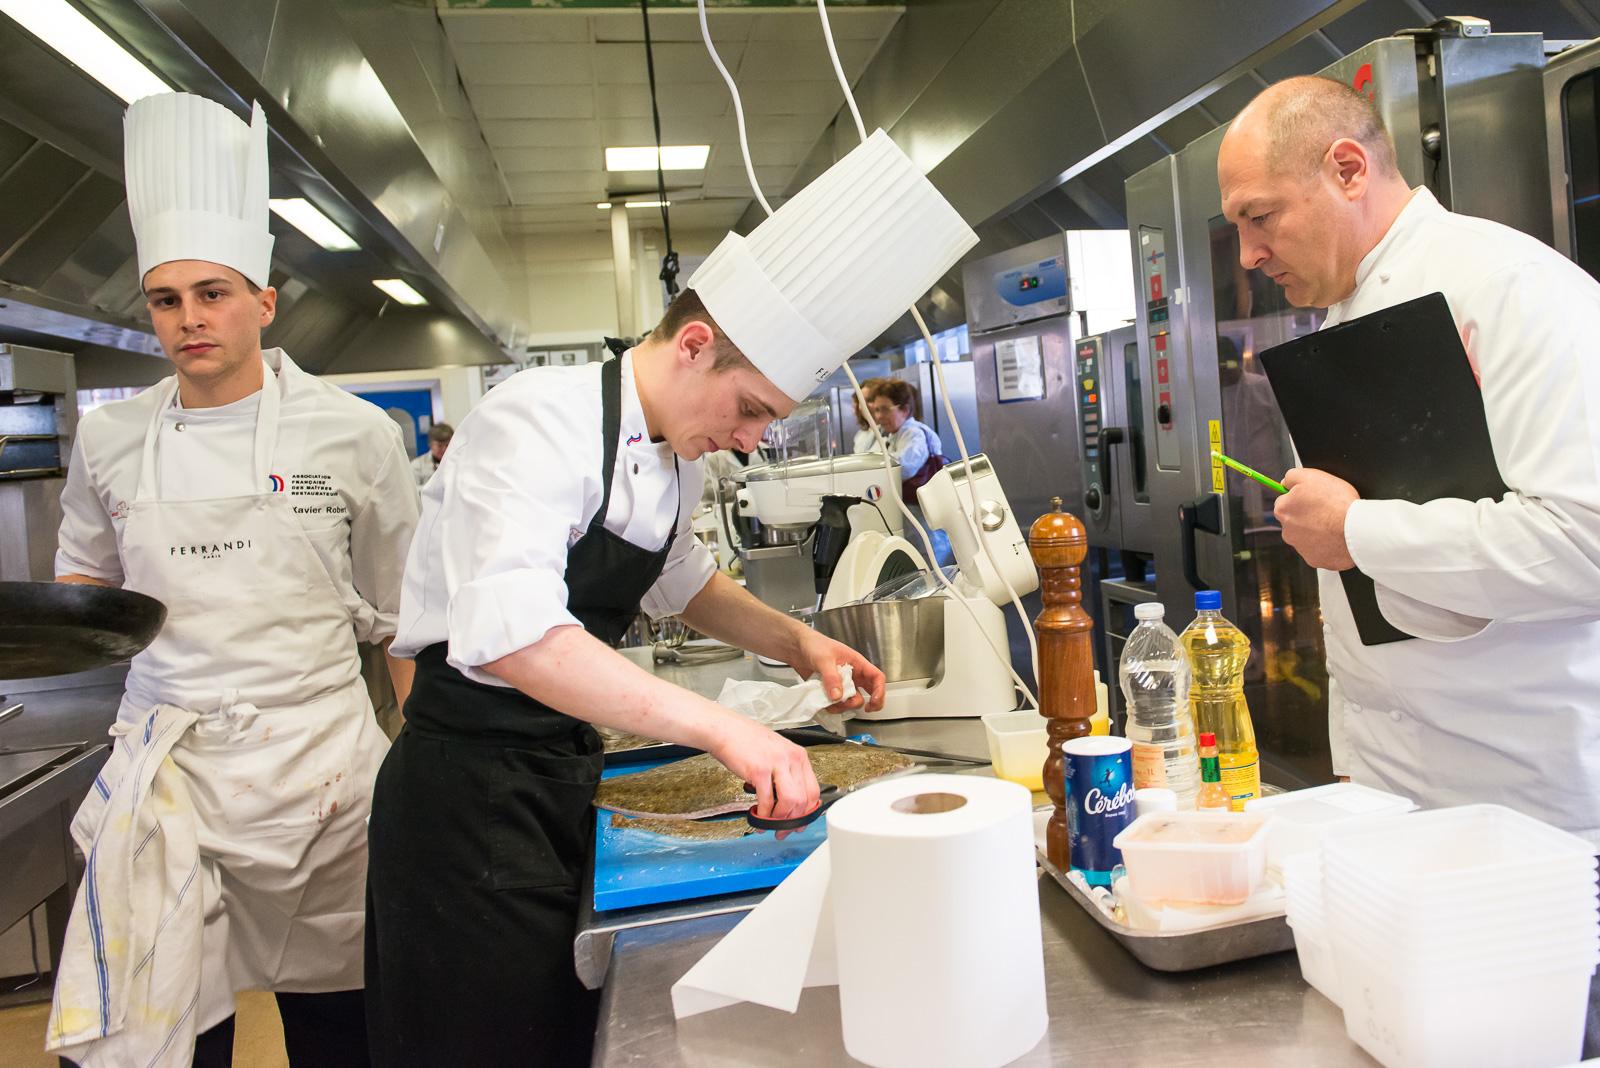 Ecole de cuisine ferrandi paris restaurant for Academie cuisine